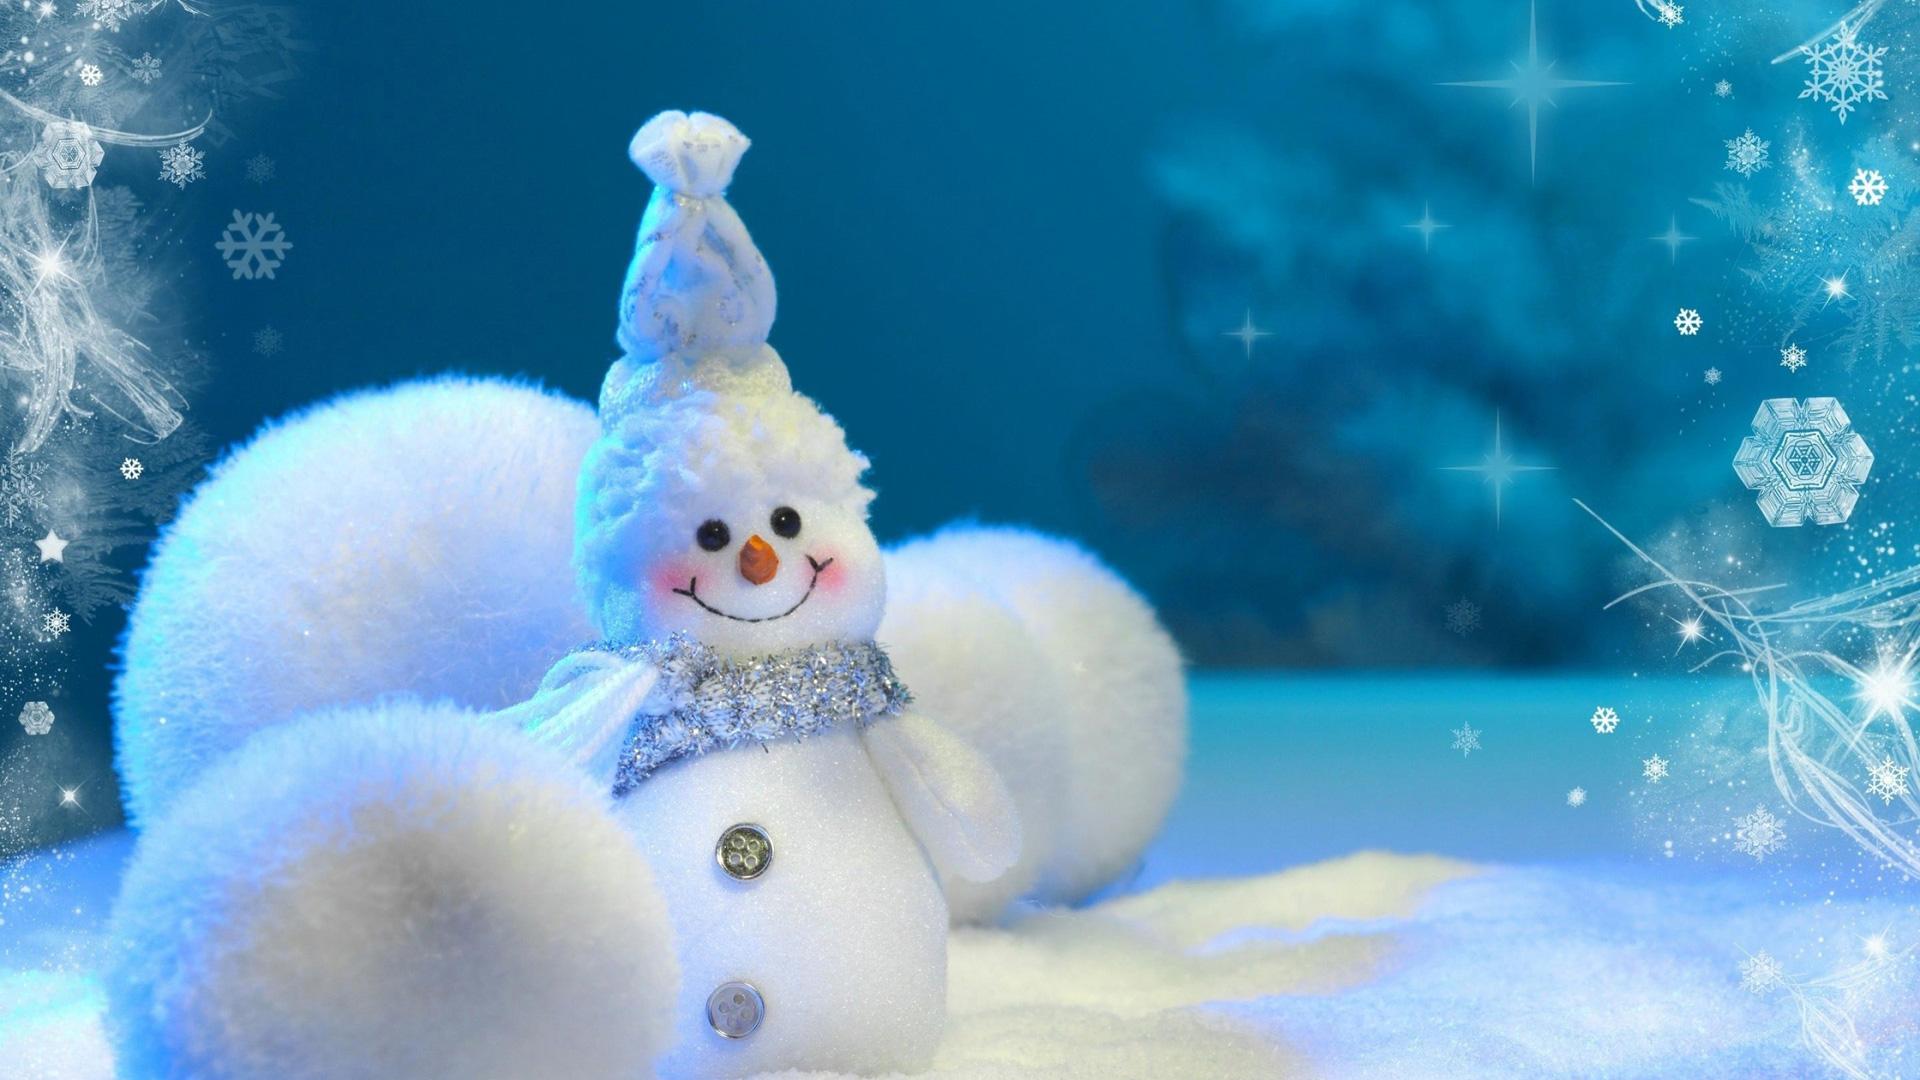 Wallpaper download cute - And Winter Full Hd Wallpapers Download 1080p Desktop Backgrounds